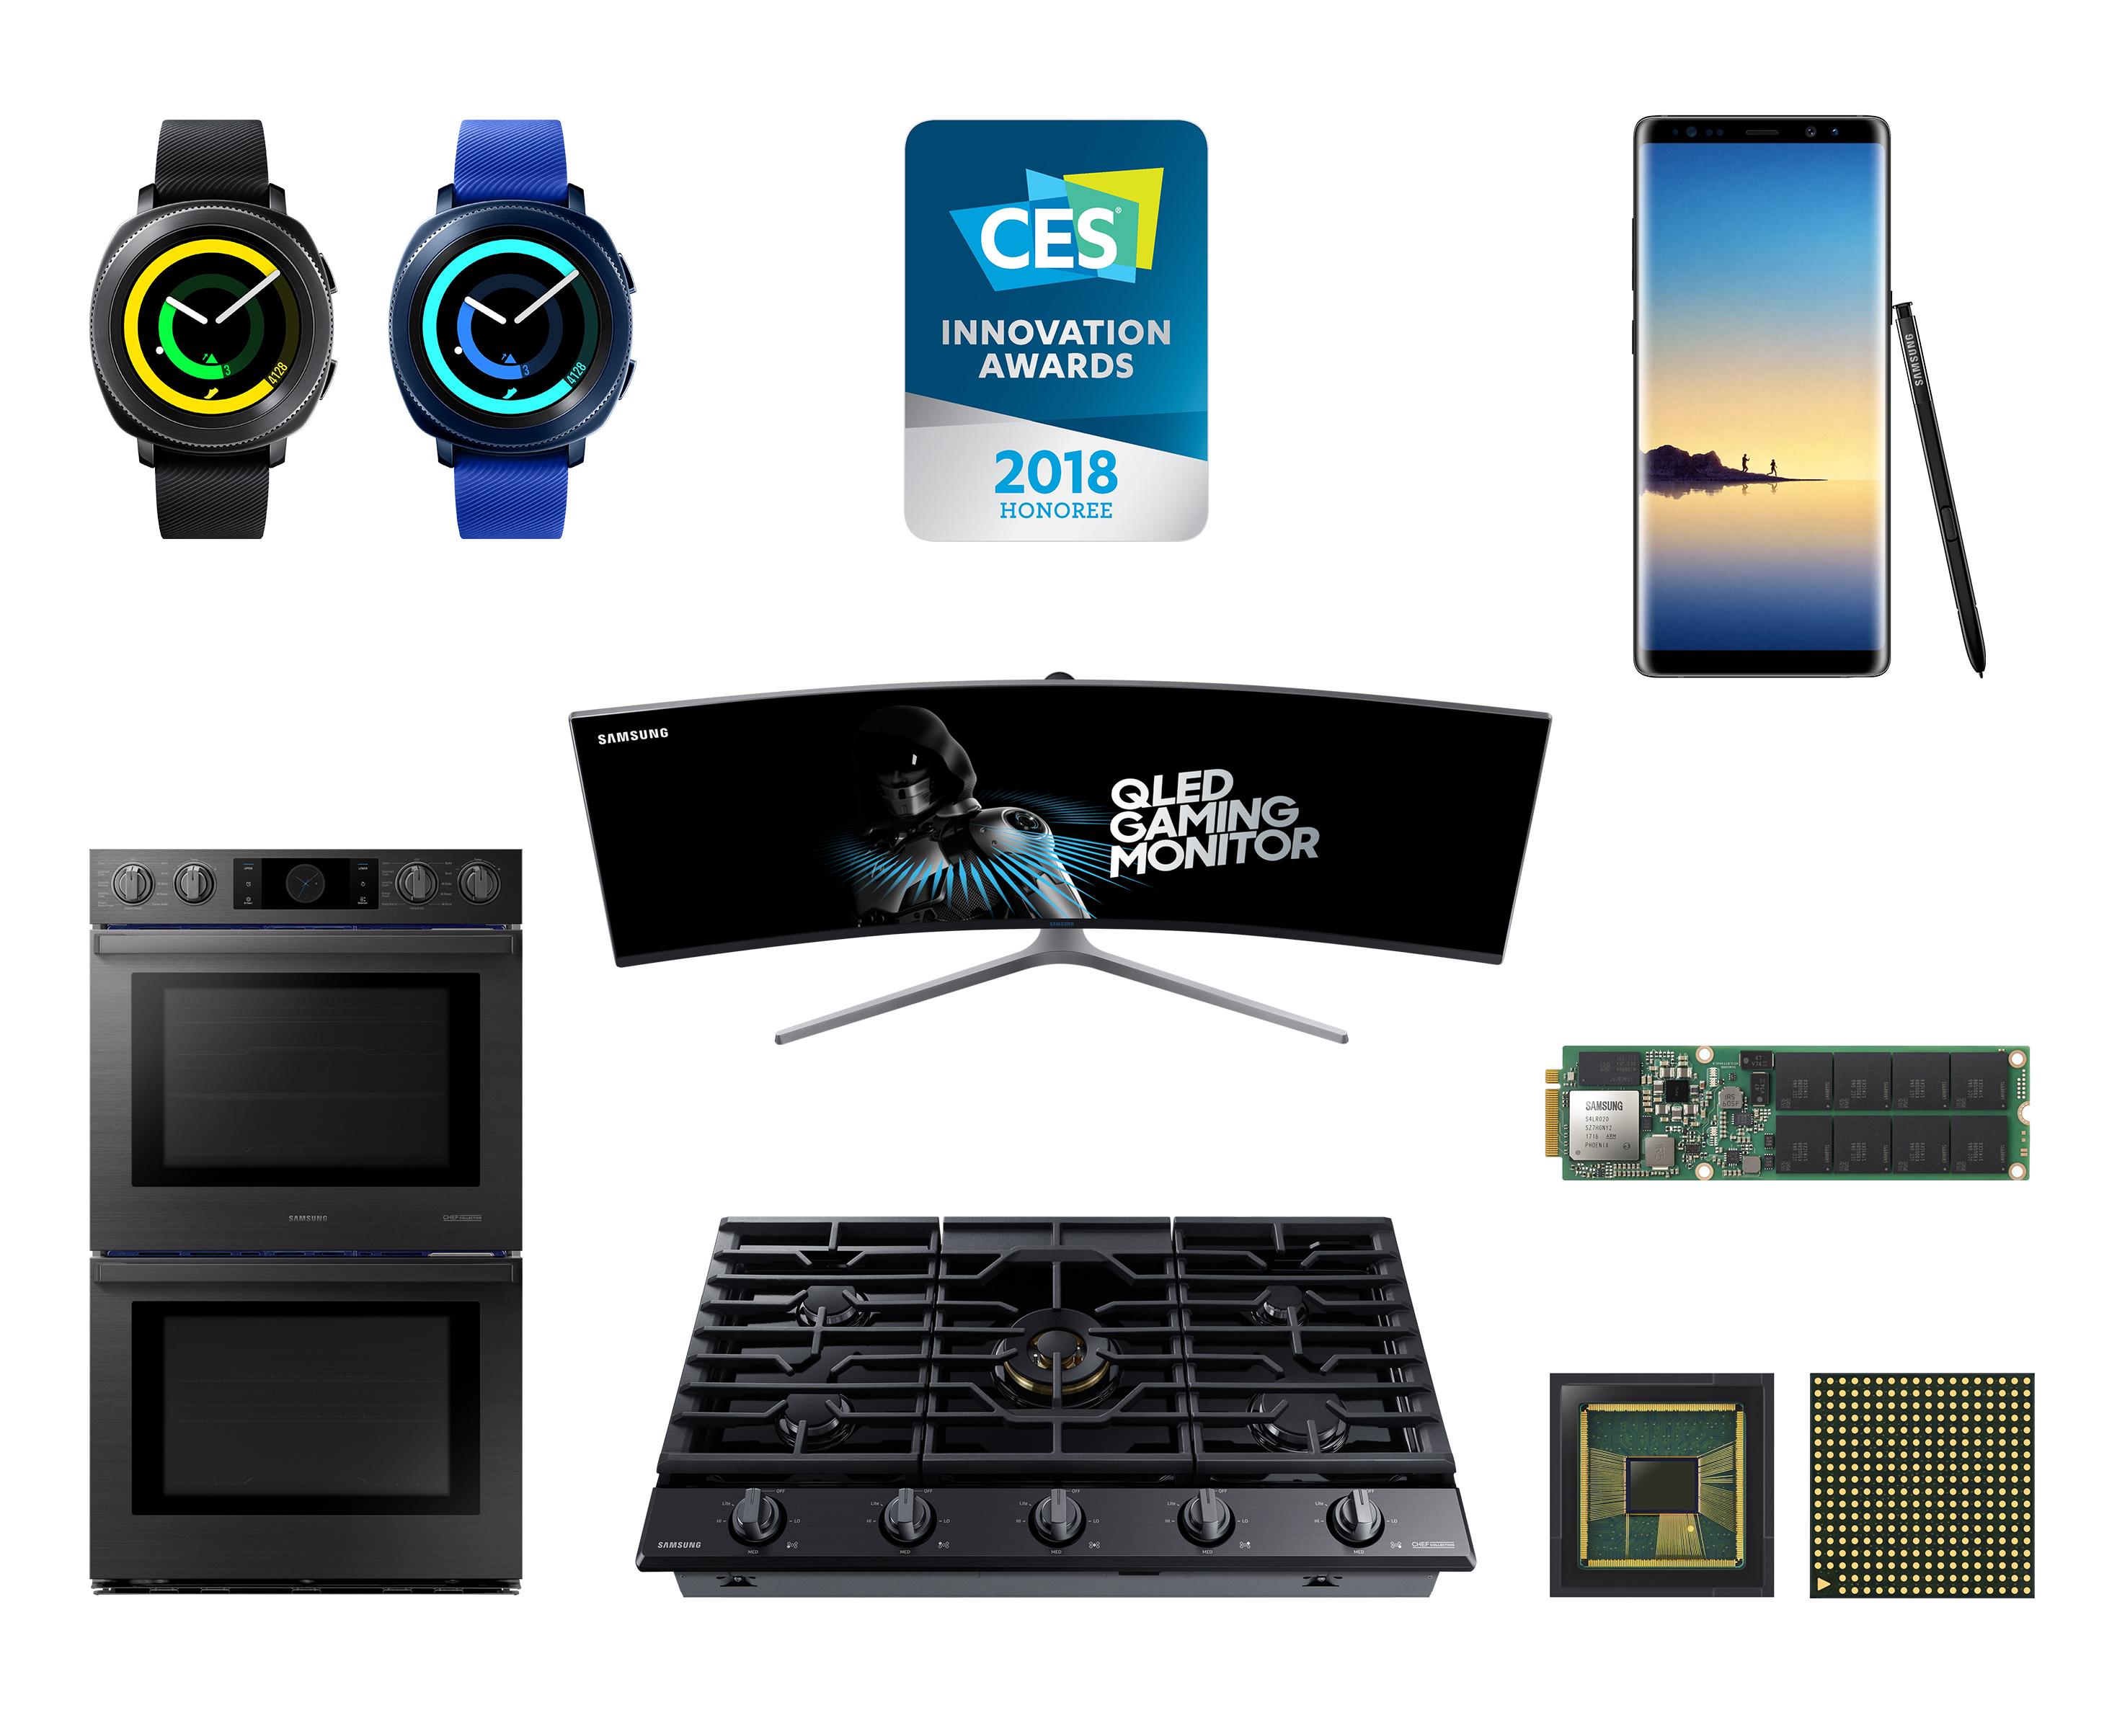 ▲CES 혁신상 수상한 삼성전자 제품들